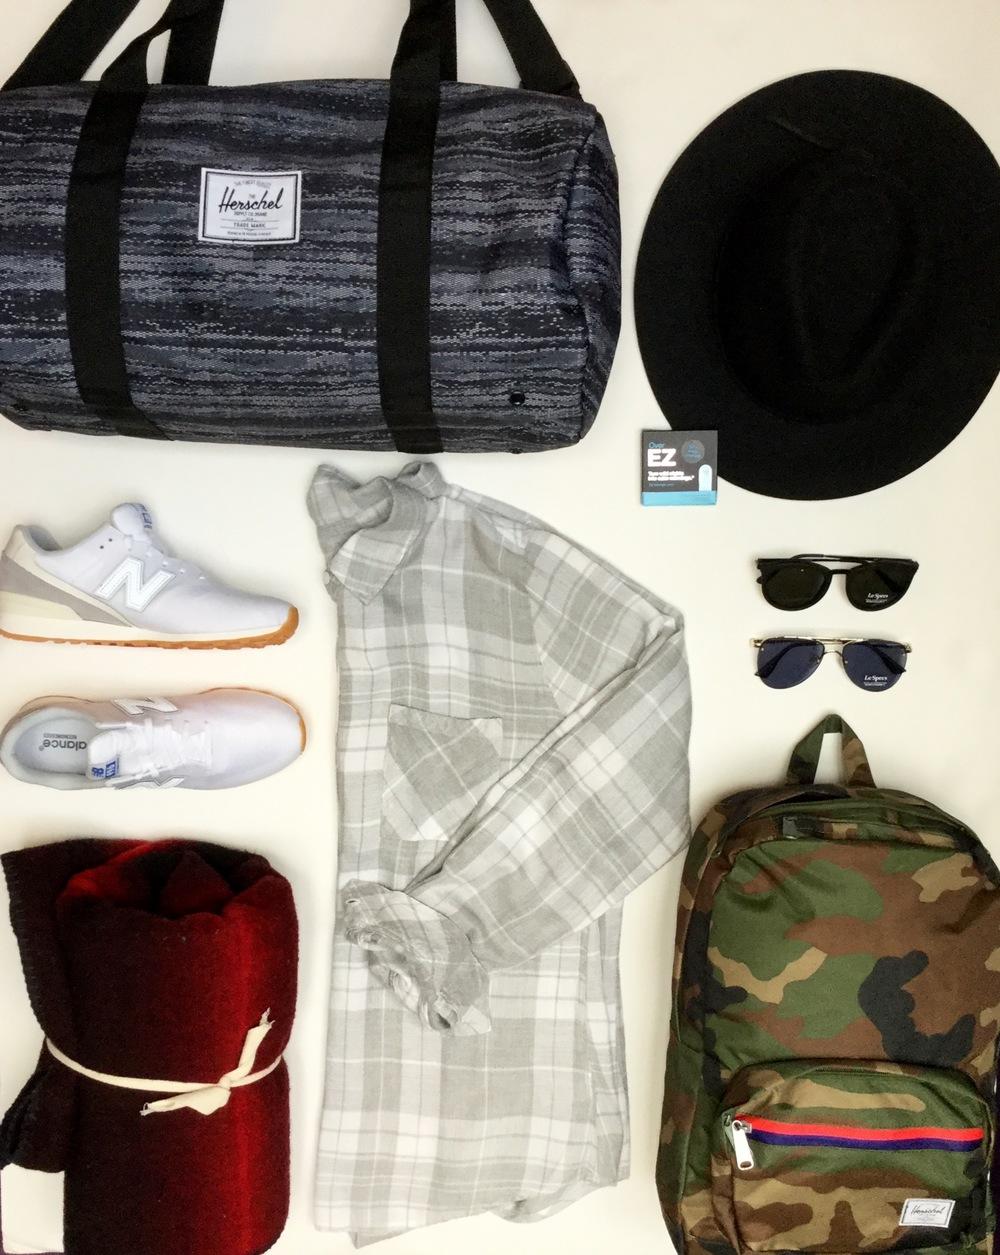 Herschel Sutton Bag $65   Brixton Hat $80   New Balance Retro Runners $130   Le Specs Sunglasses $110   Rails Plaid Shirt $215   Woolrich Blanket $120   Herschel Backpack $80